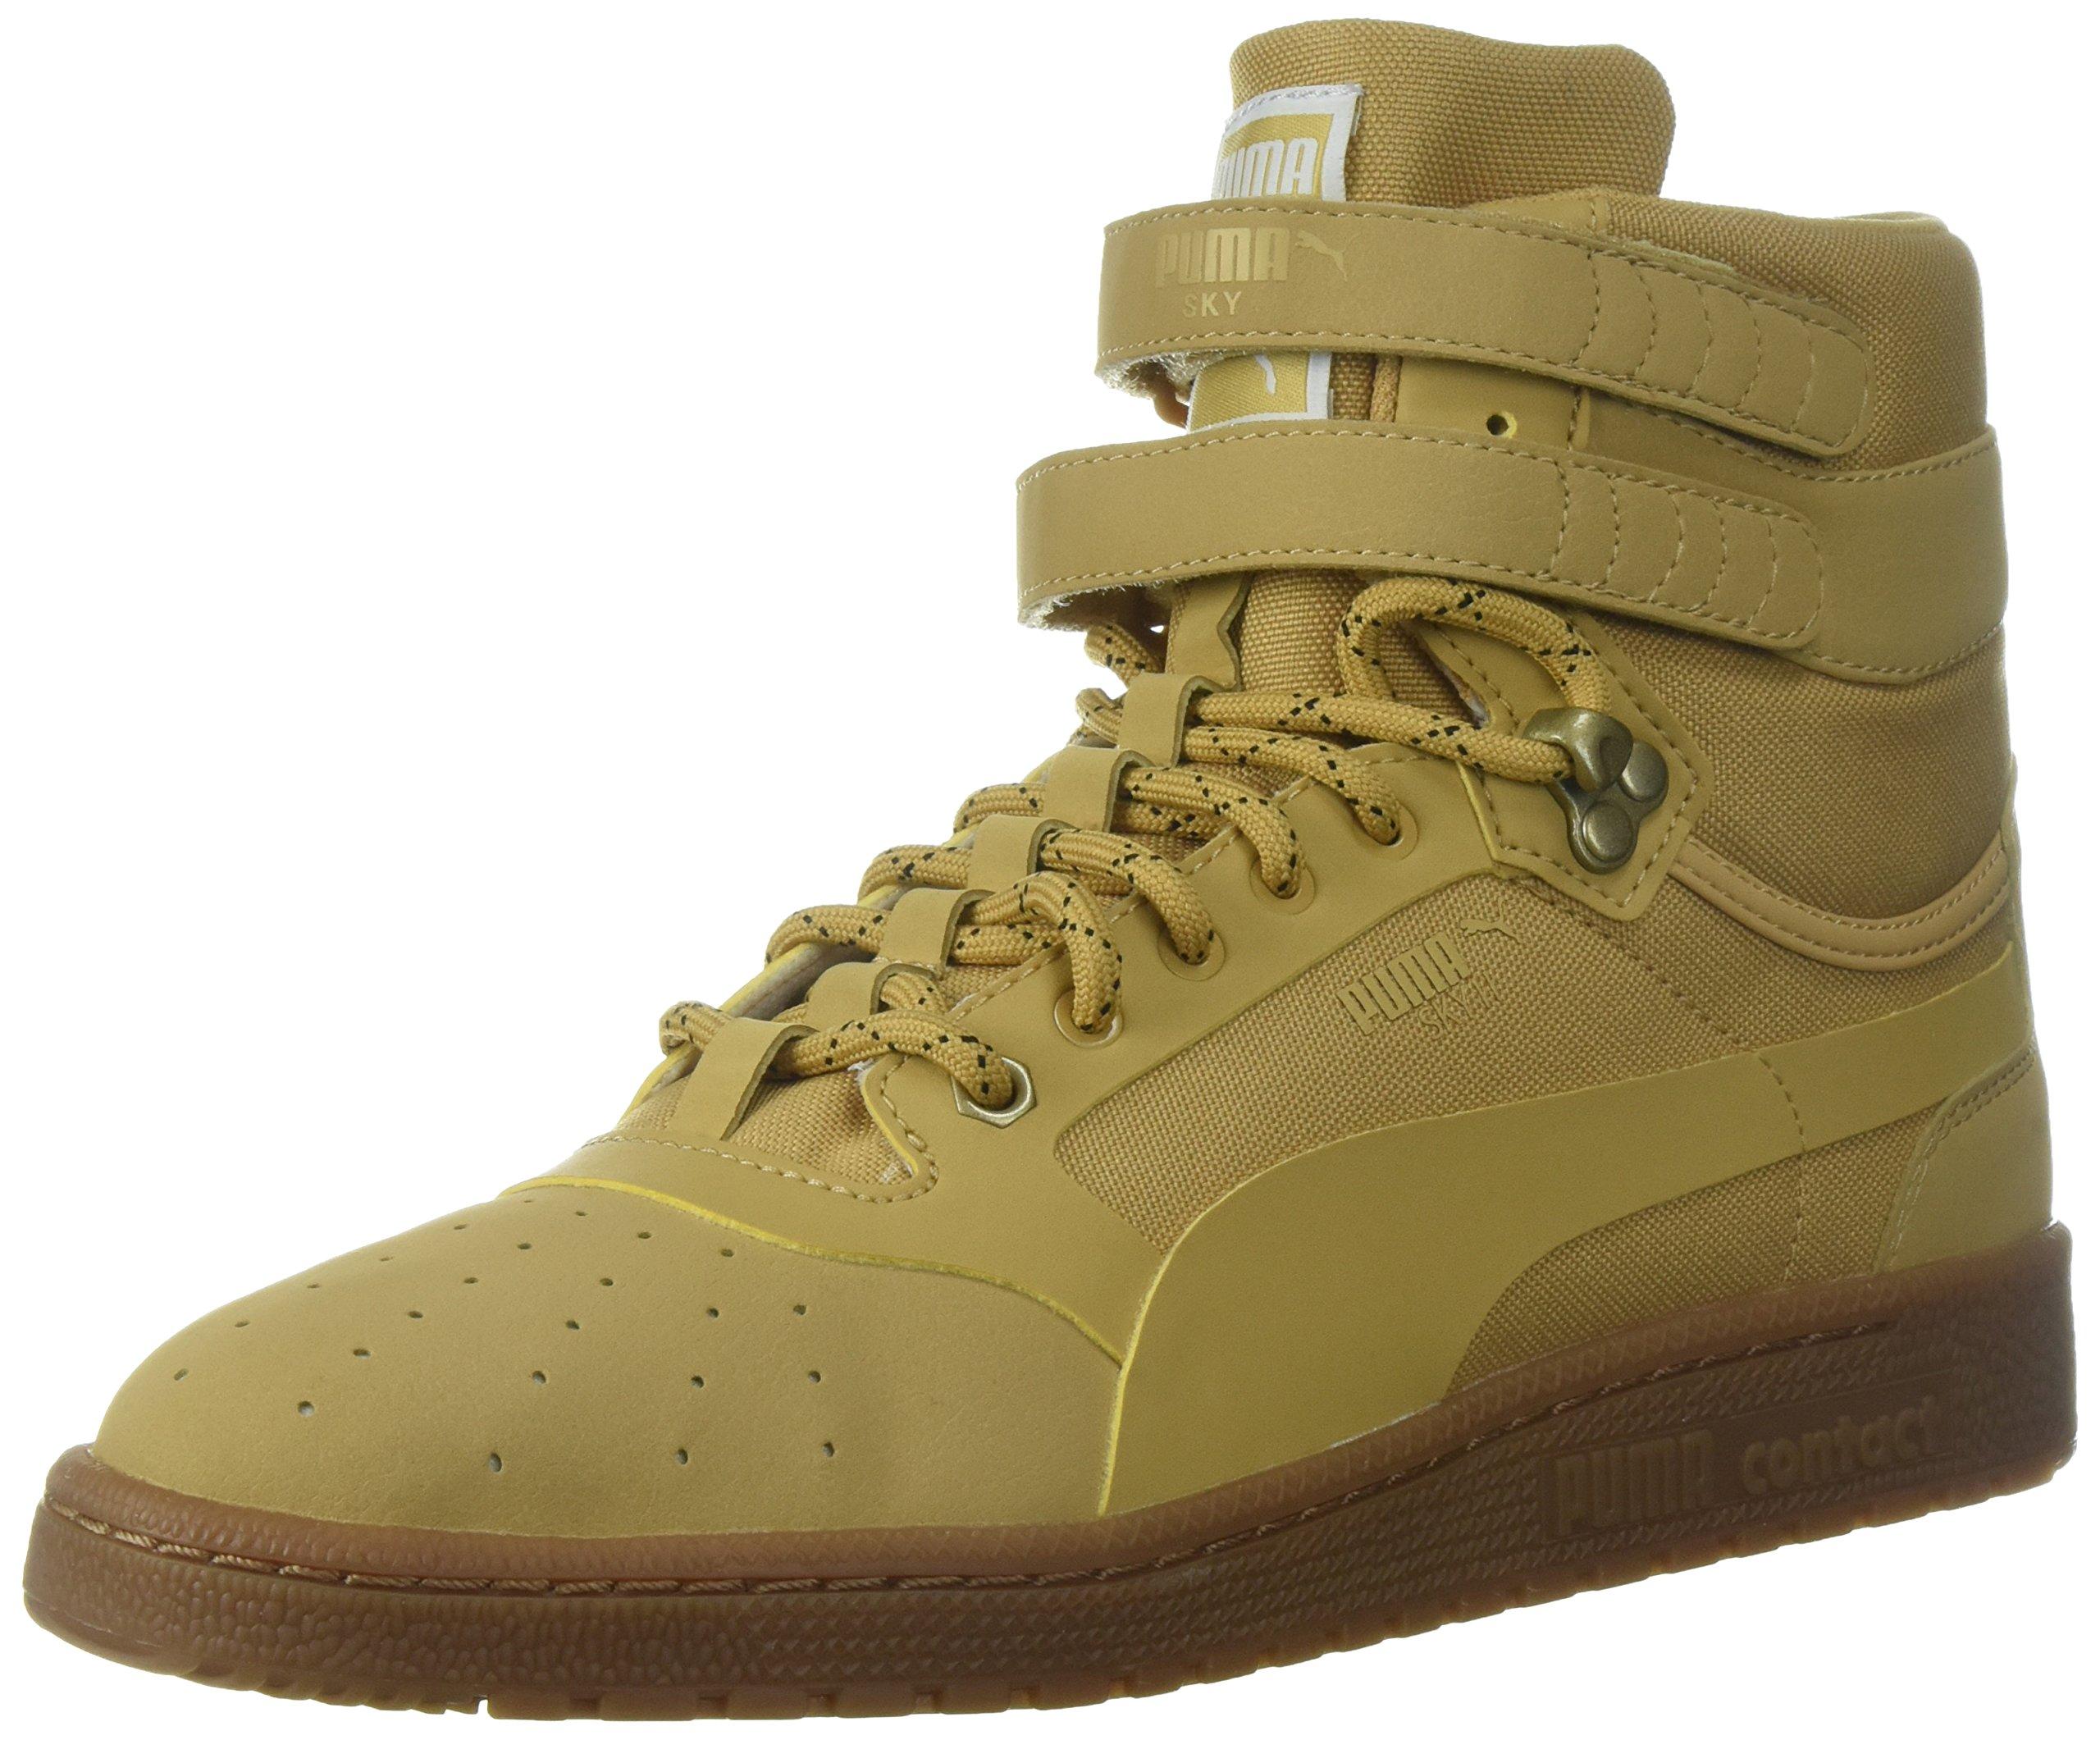 PUMA Men's Sky II Hi Weatherproof Sneaker, Taffy, 7